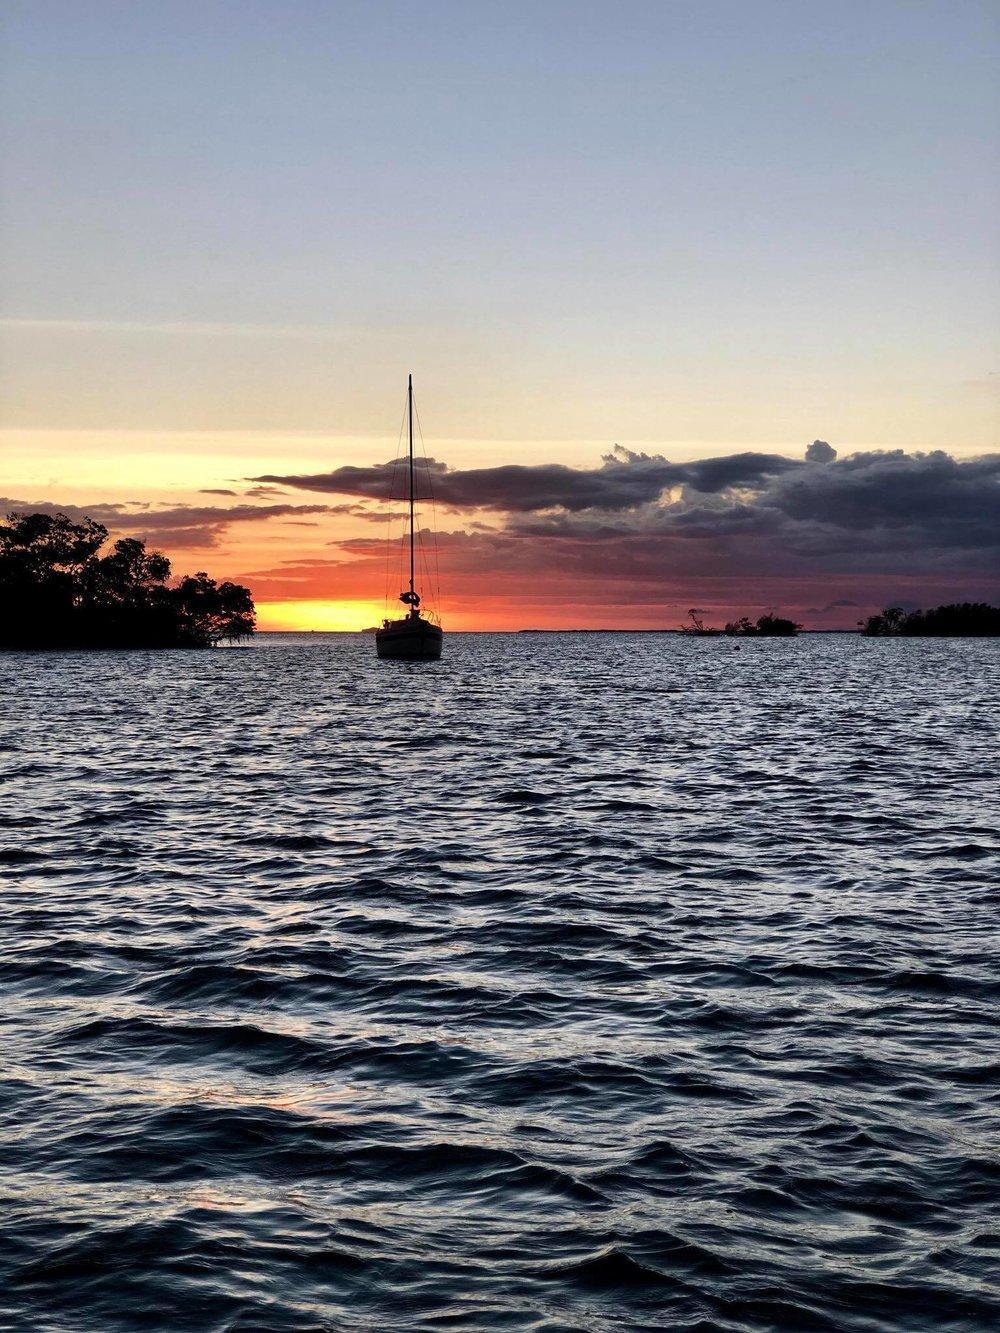 Sailing Life Day 344 Happy weekend everyone8.jpg